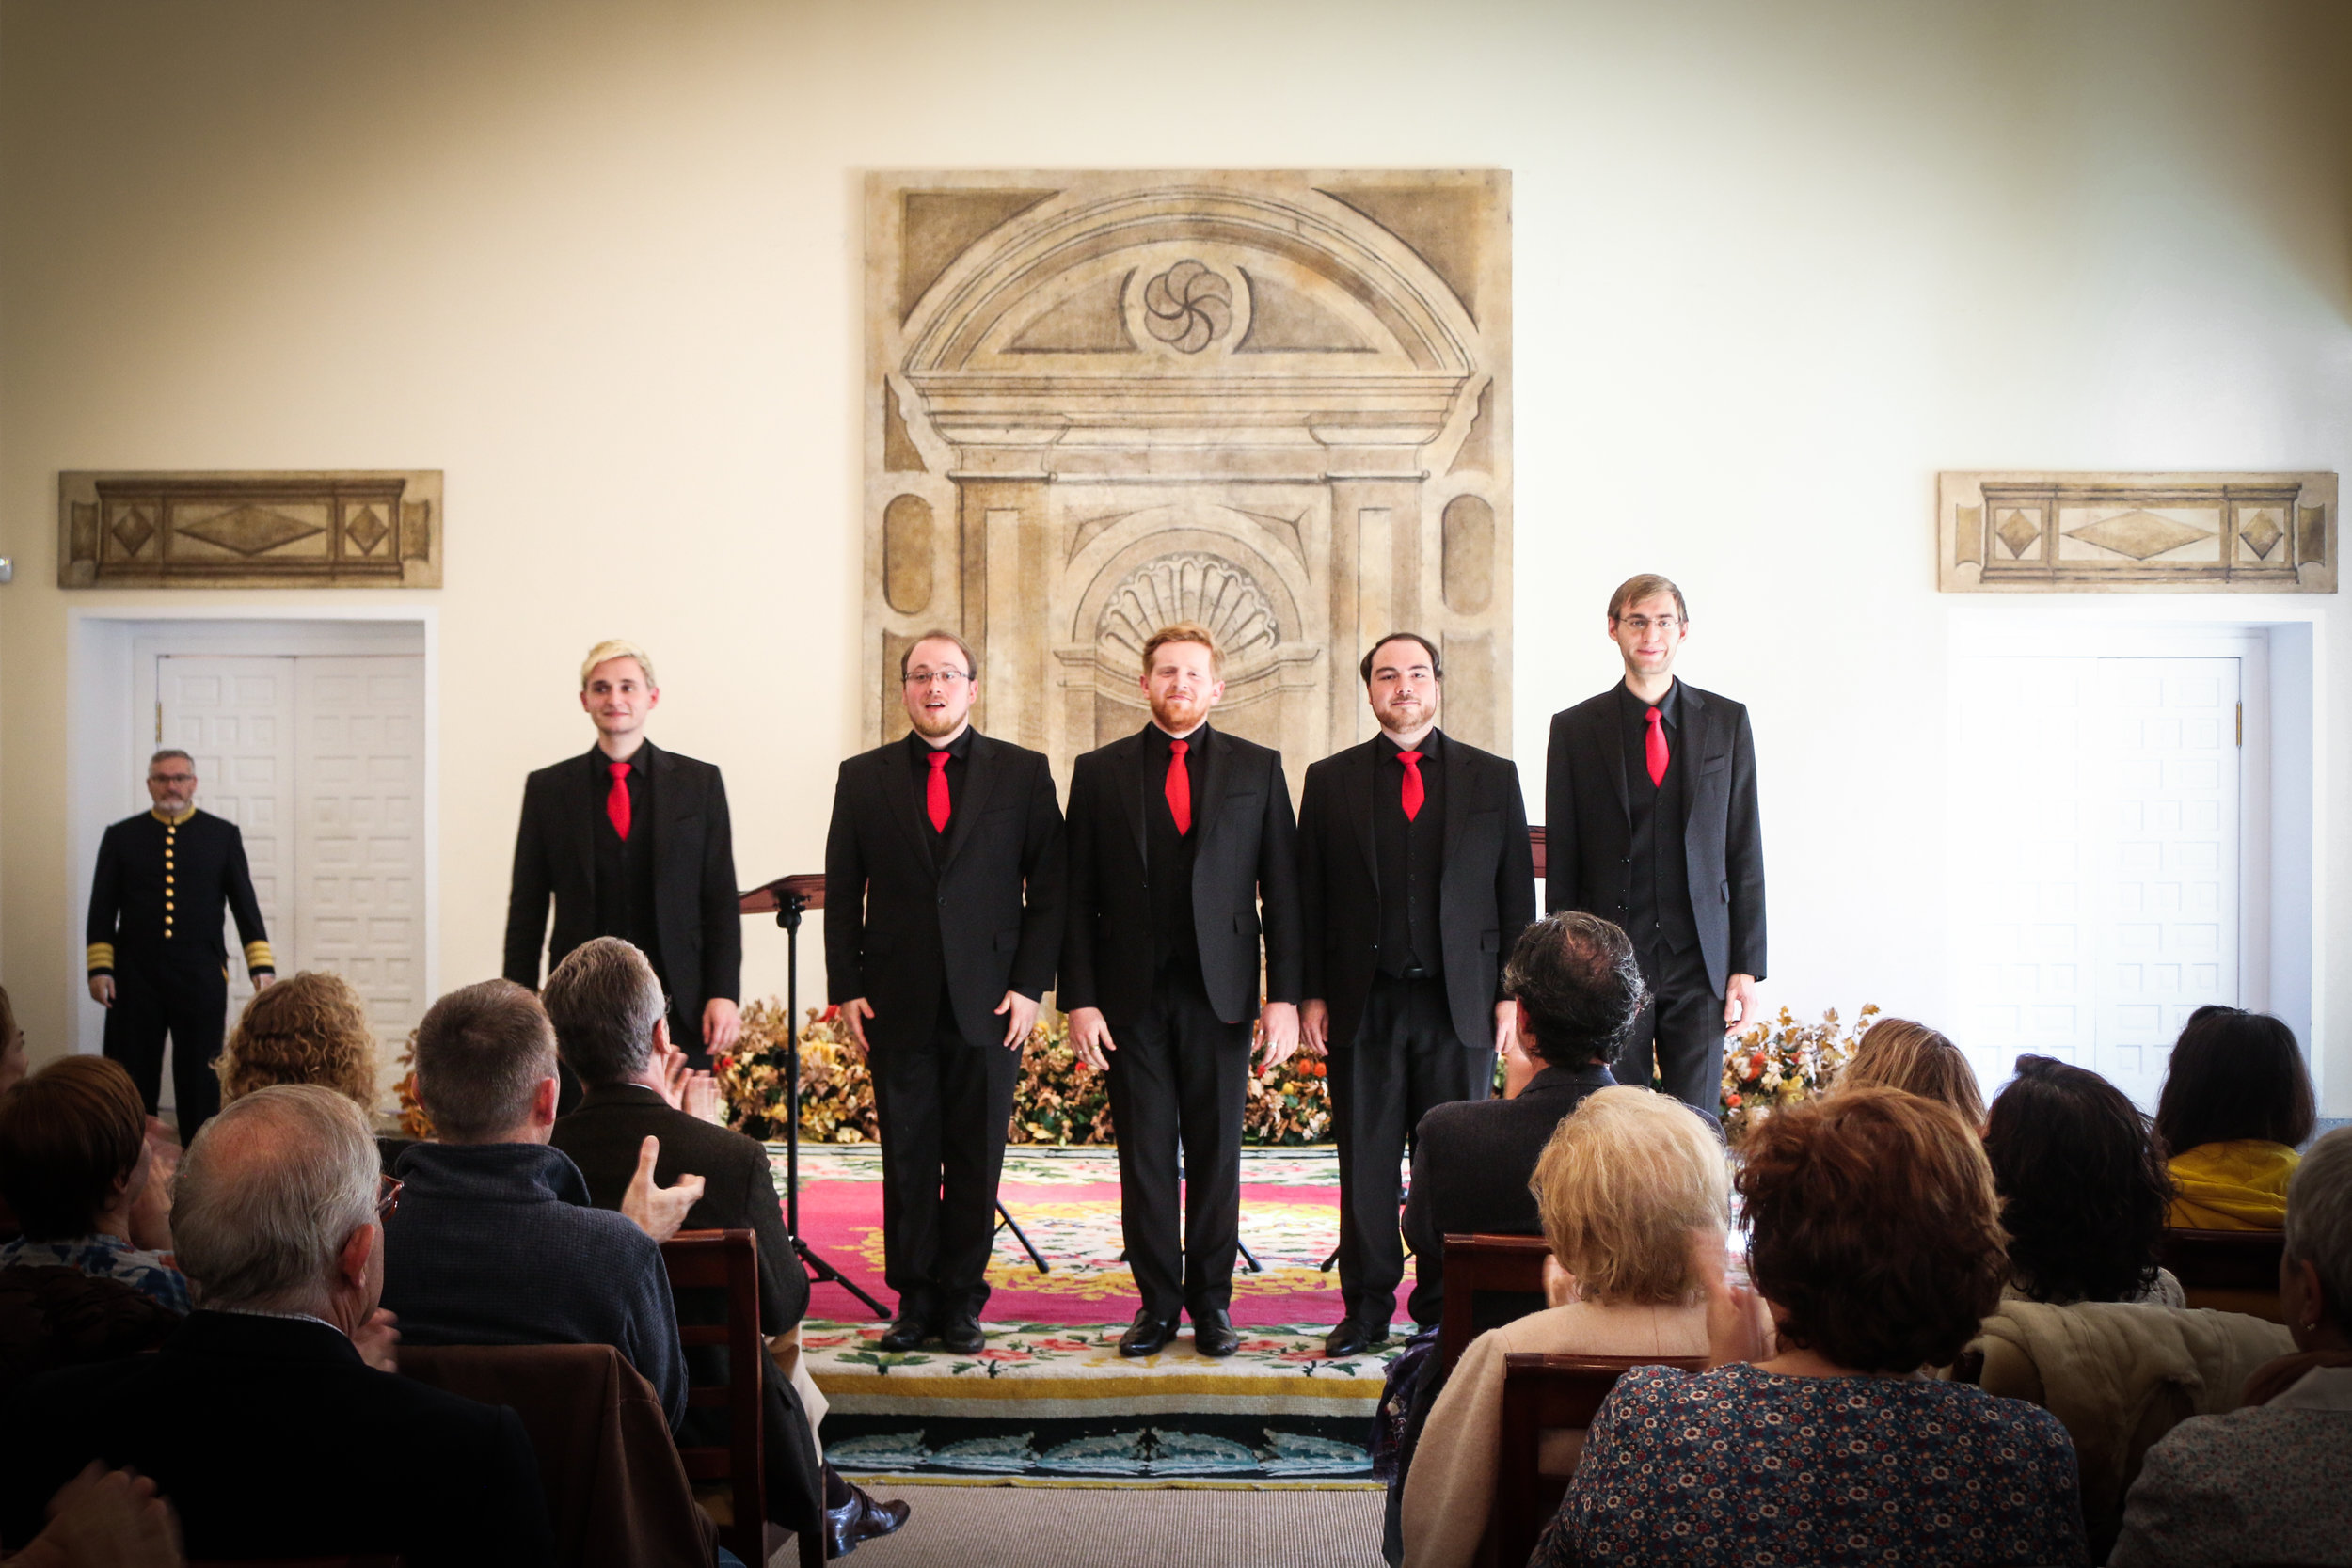 Freude im Königlichen Palast von Segovia | Great Concert in the palace of Segovia